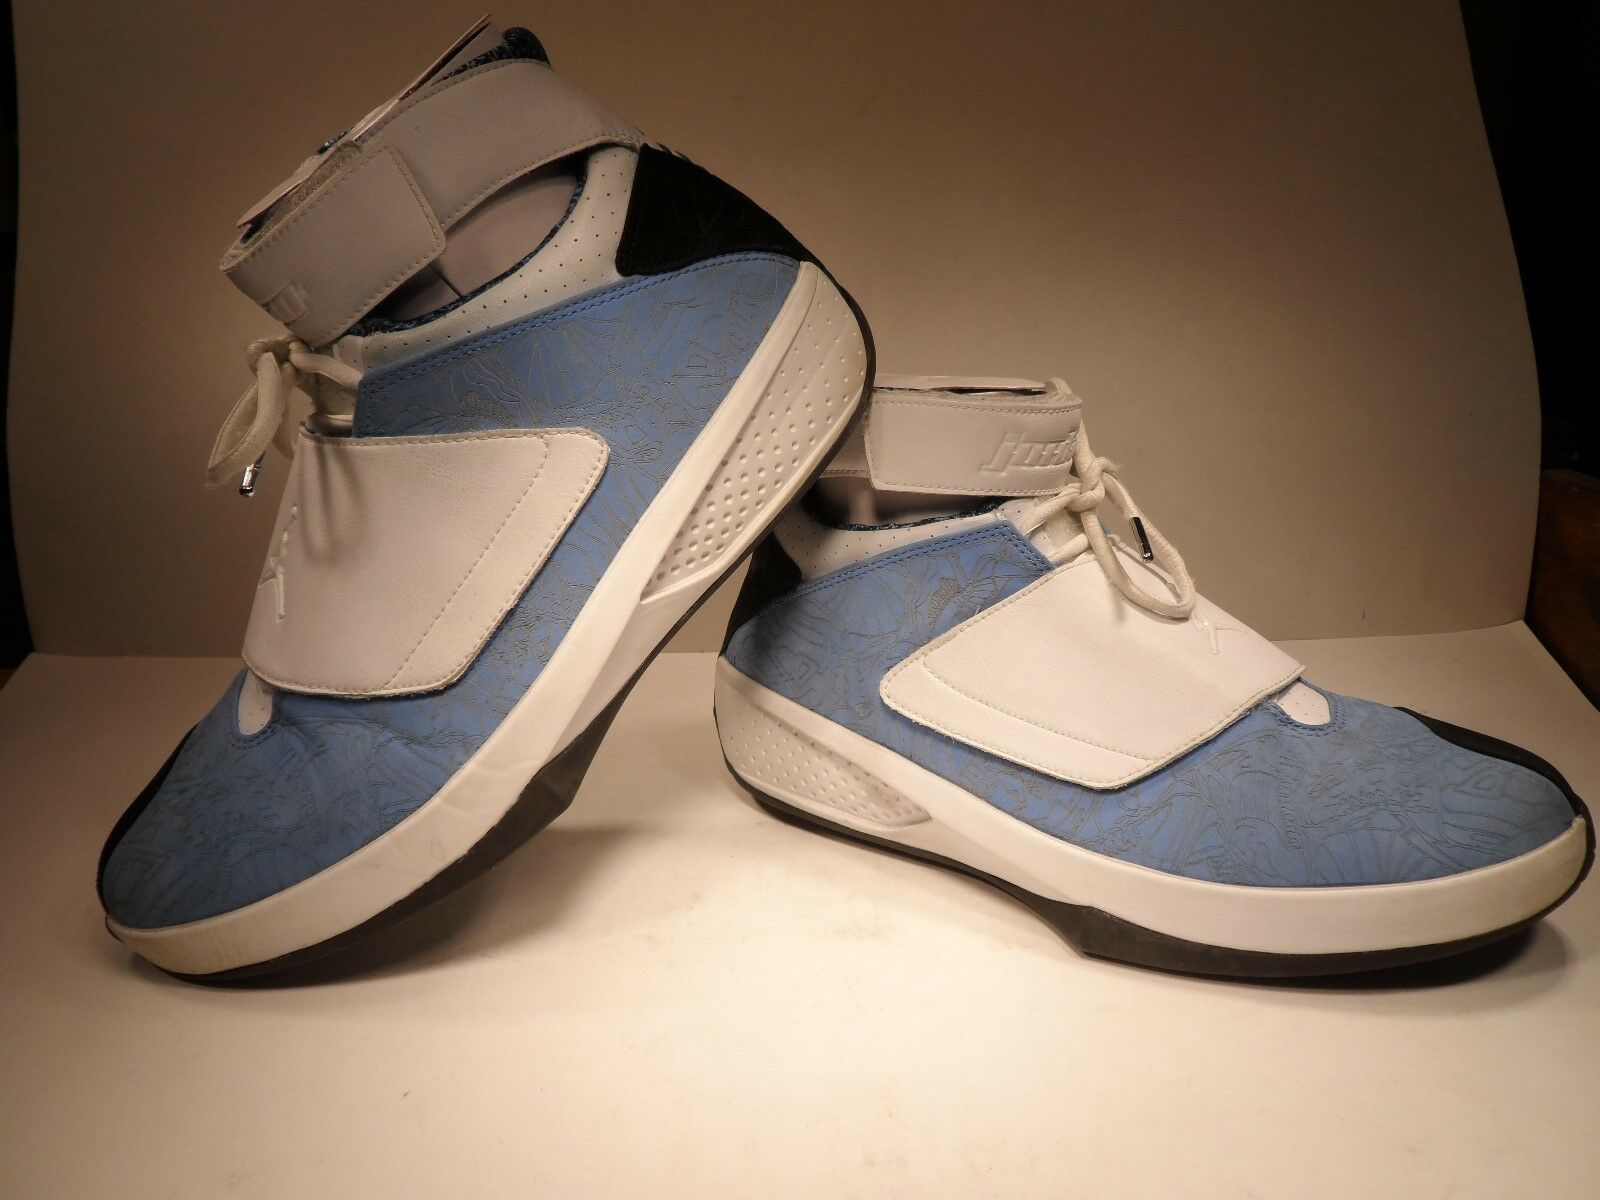 Nike air jordan xx 20 west coast protezioni university blu / bianco blk 2005 protezioni coast sz 10,5 9c70ef